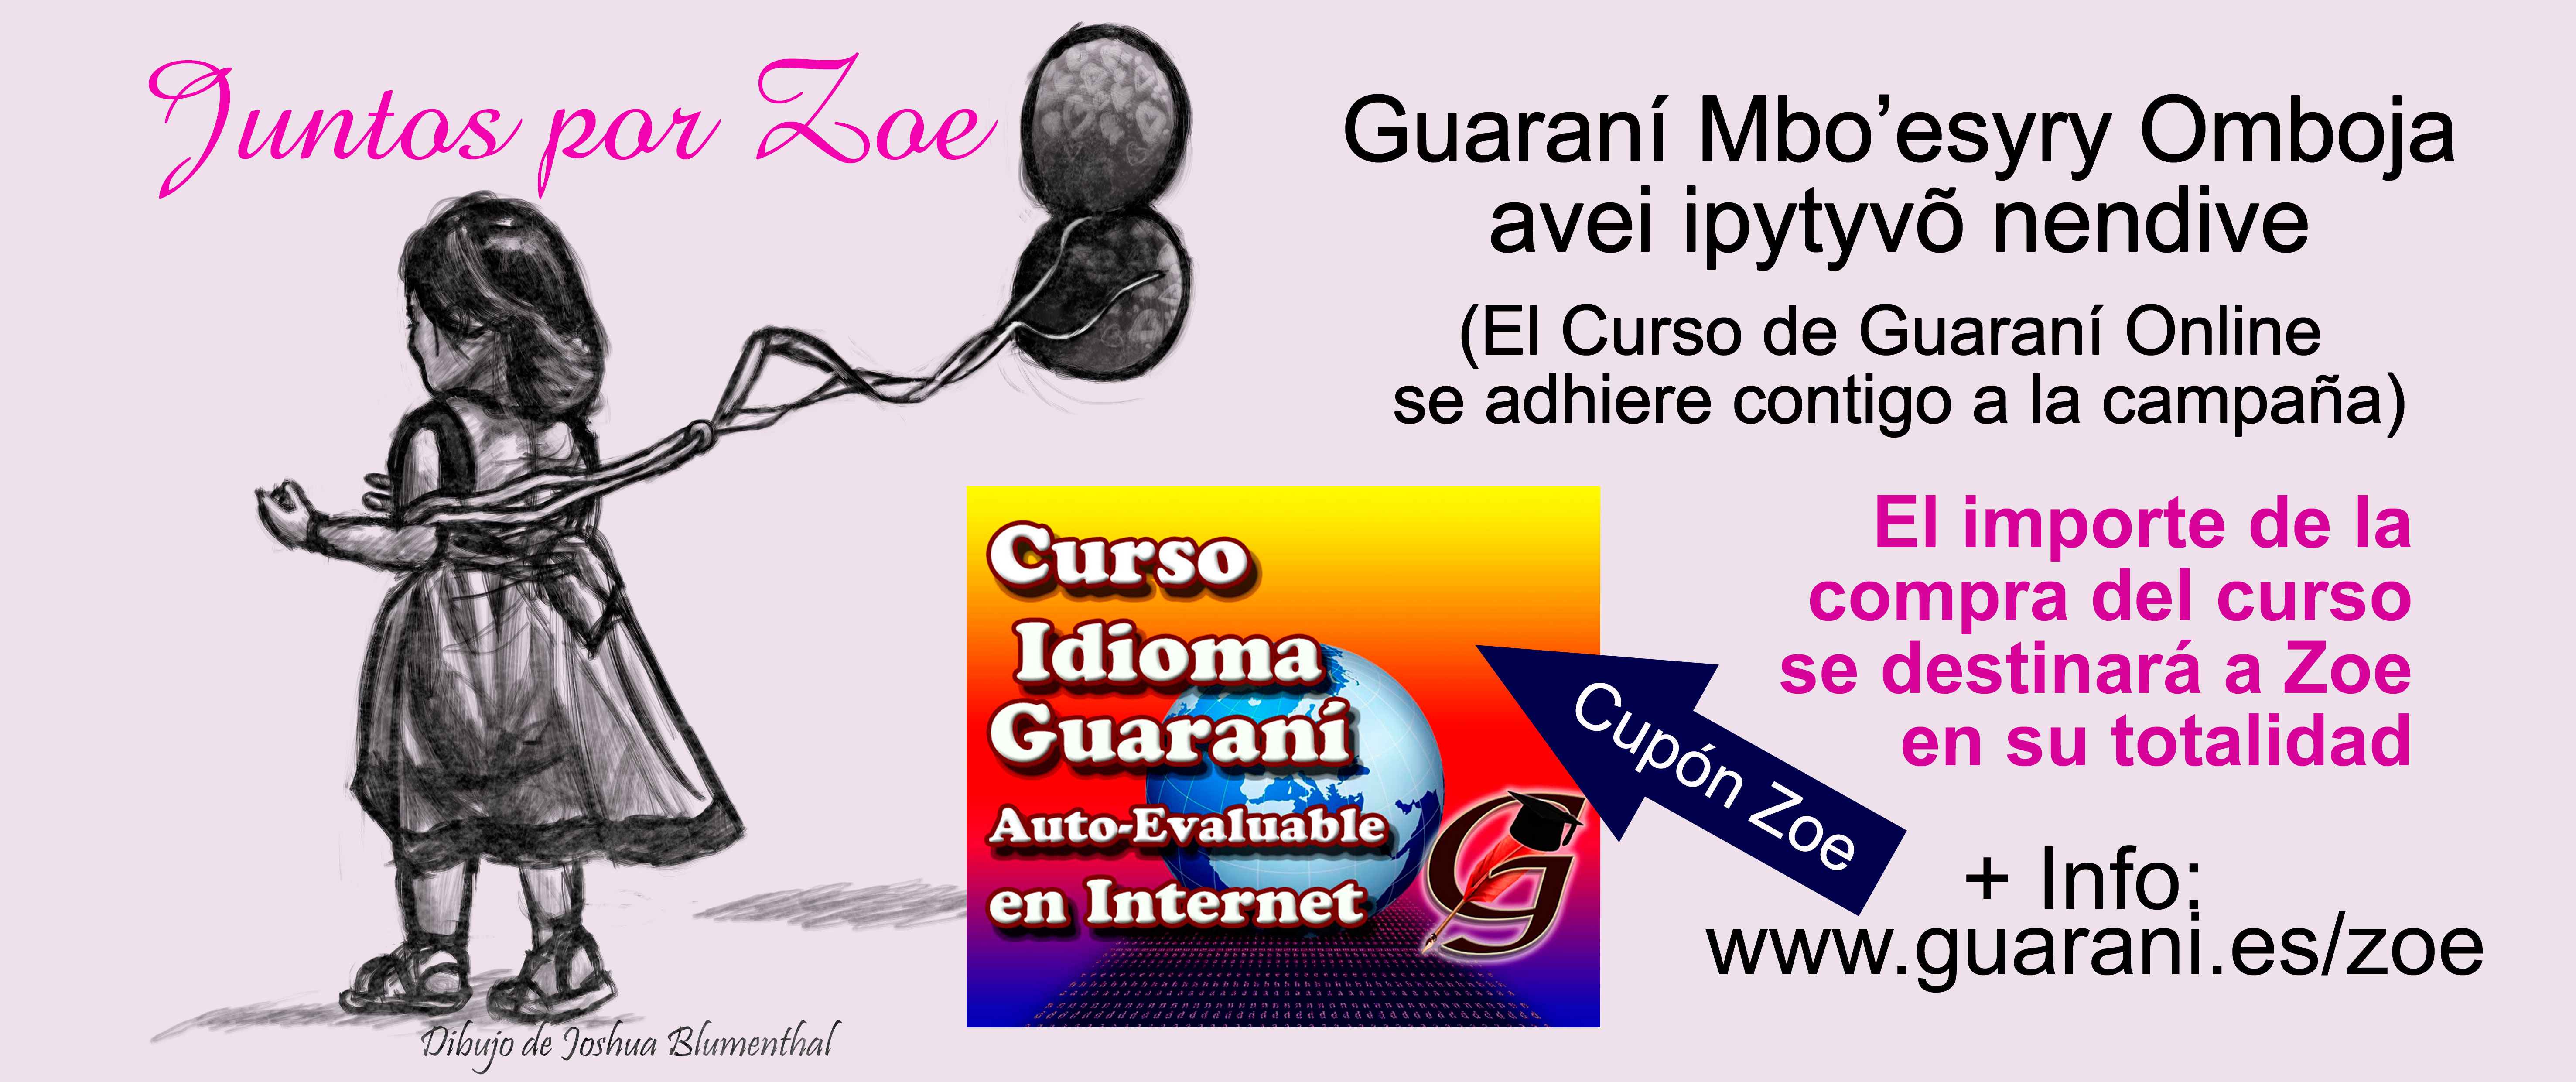 juntos-x-ZOE-guarani-online